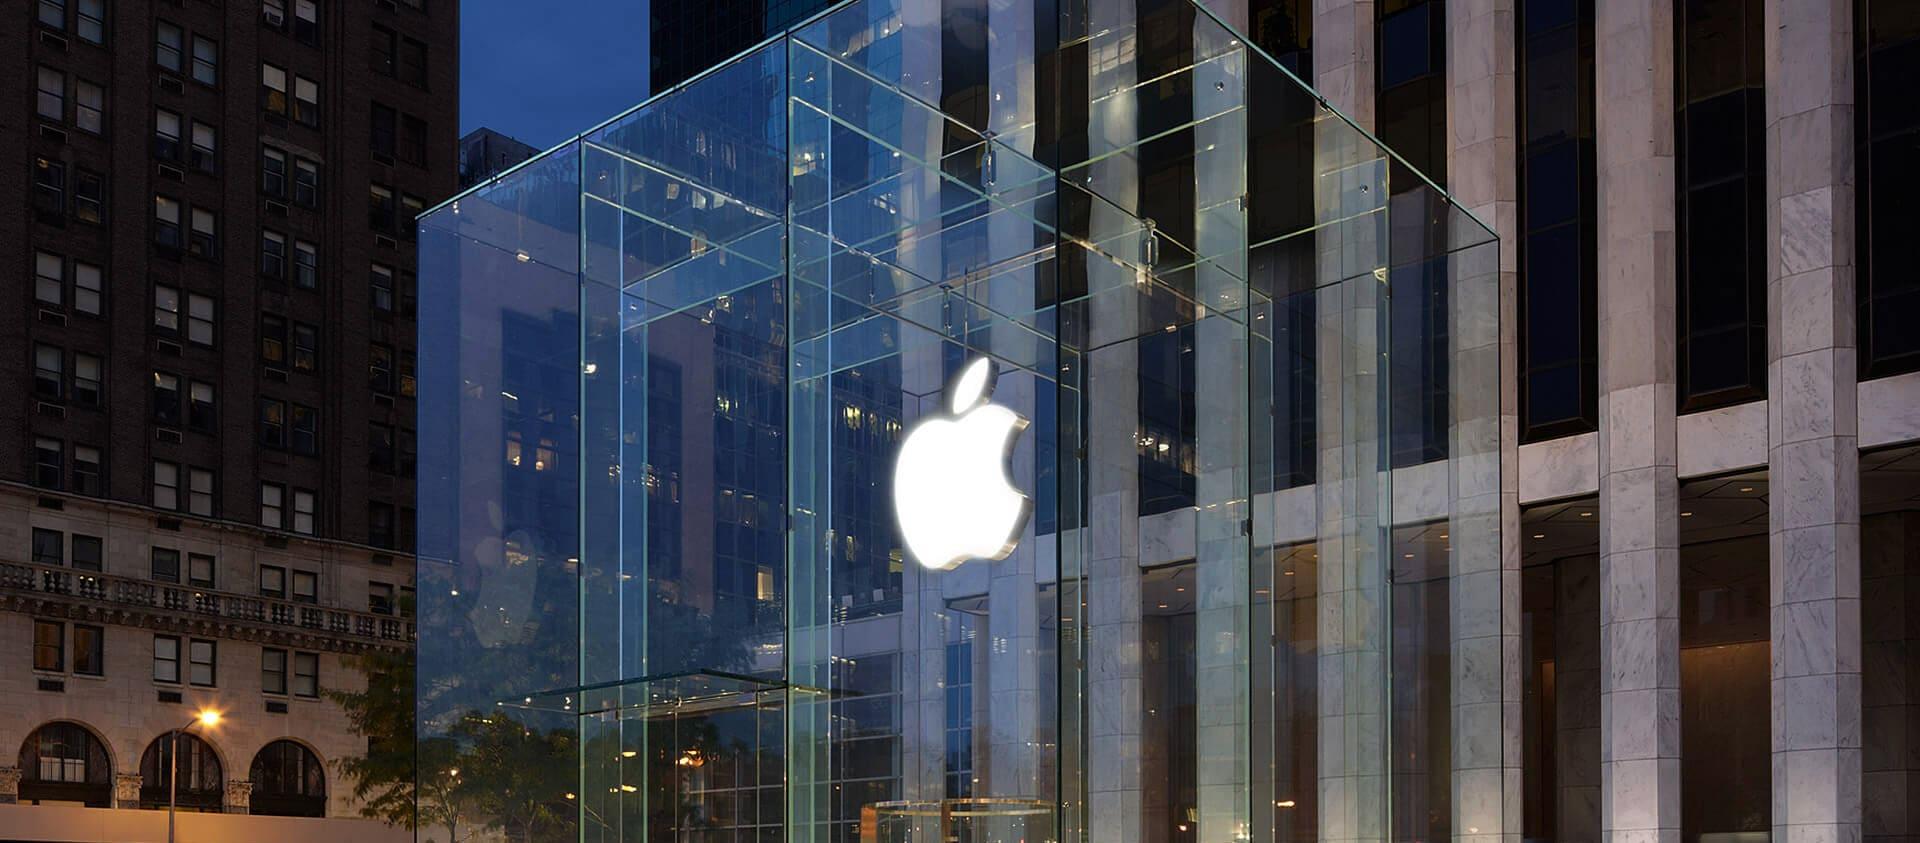 Apple donated 10 million N95 masks